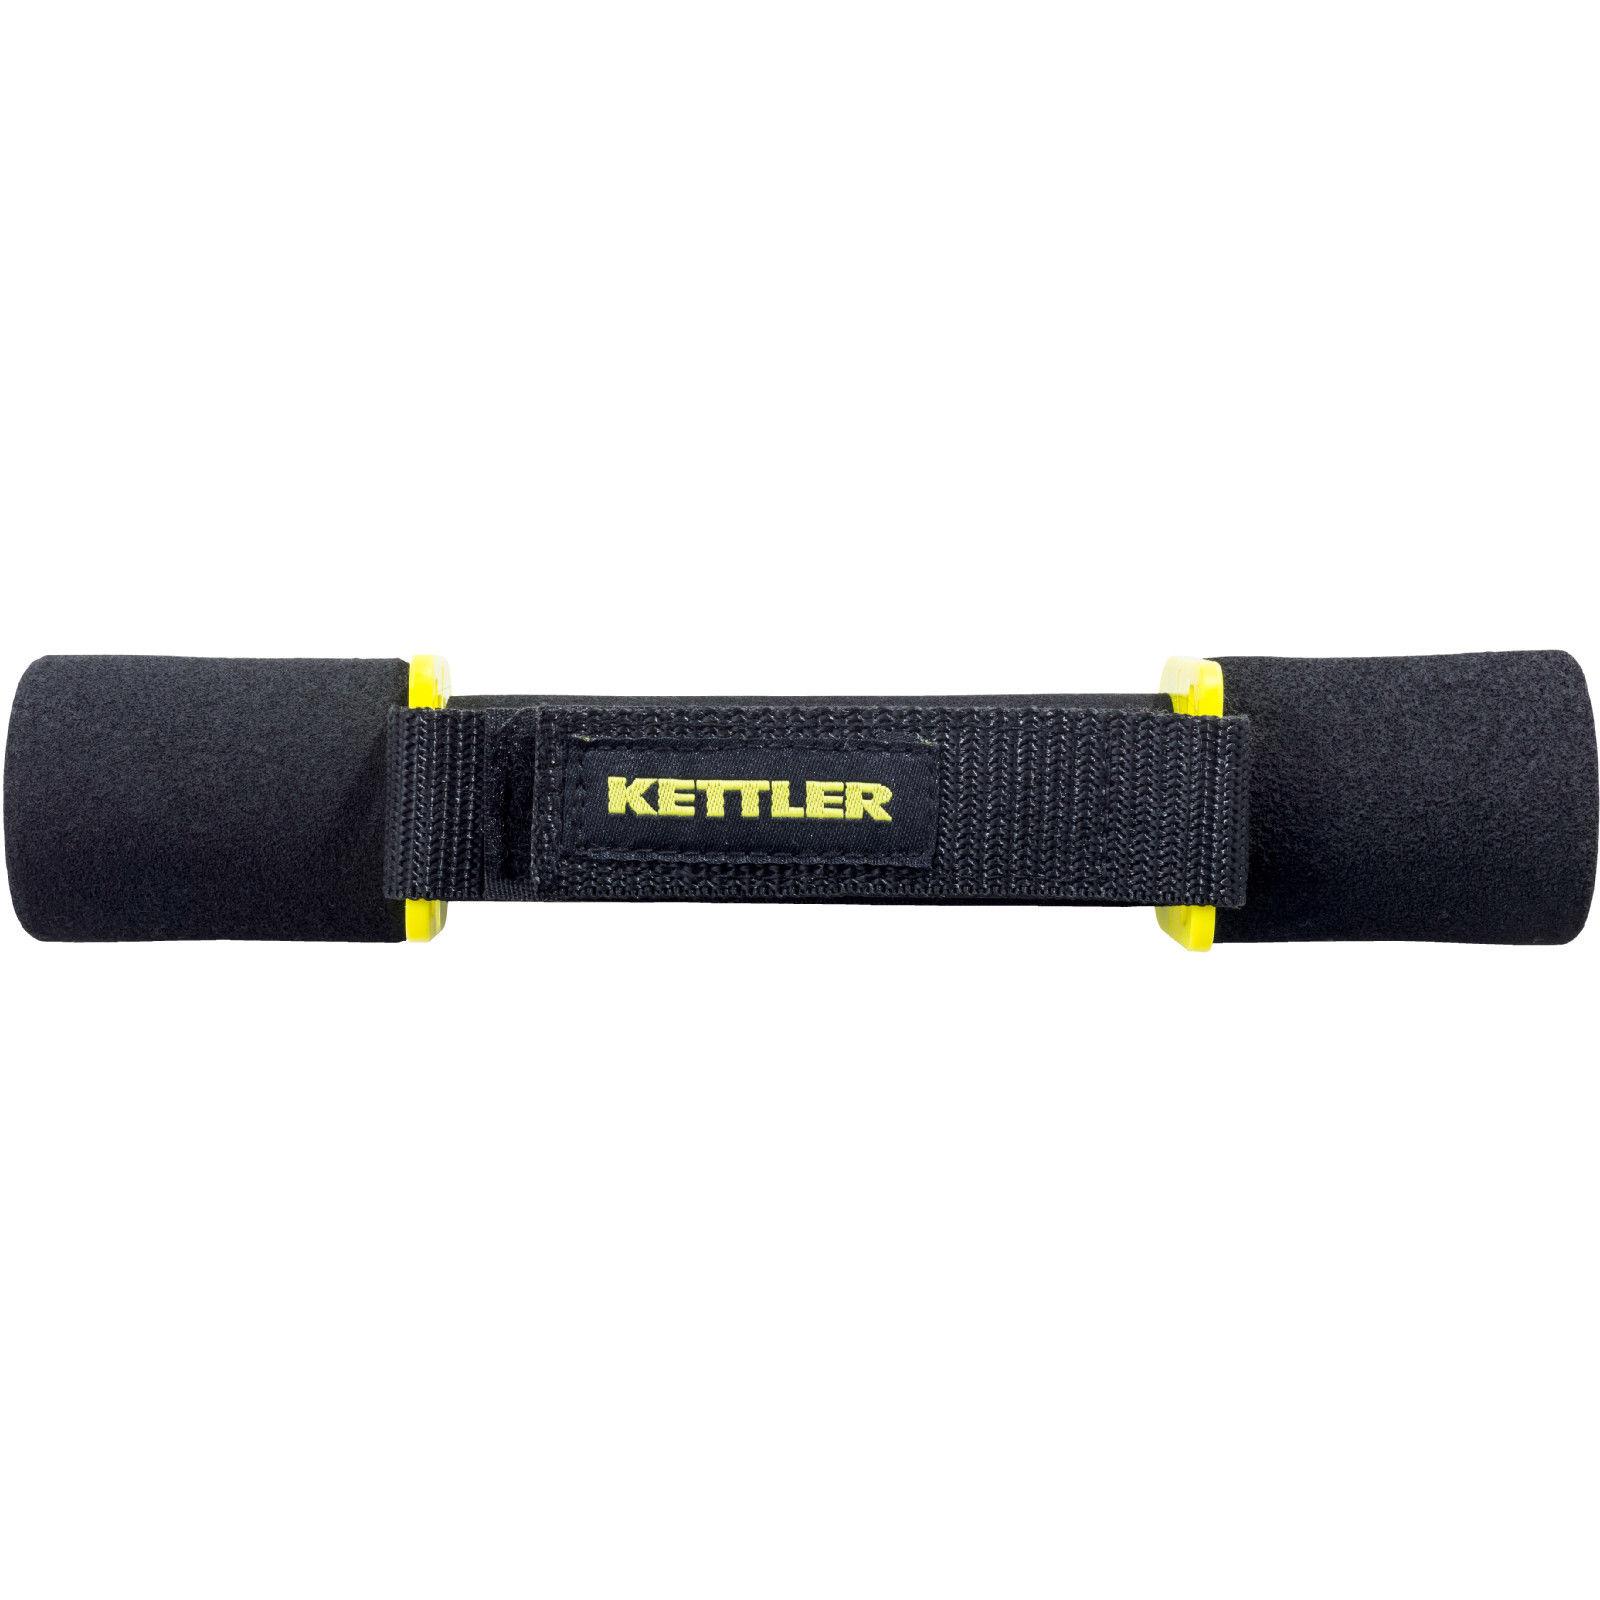 96993 KETTLER Aerobic-Hanteln blau Paar 2x1 kg